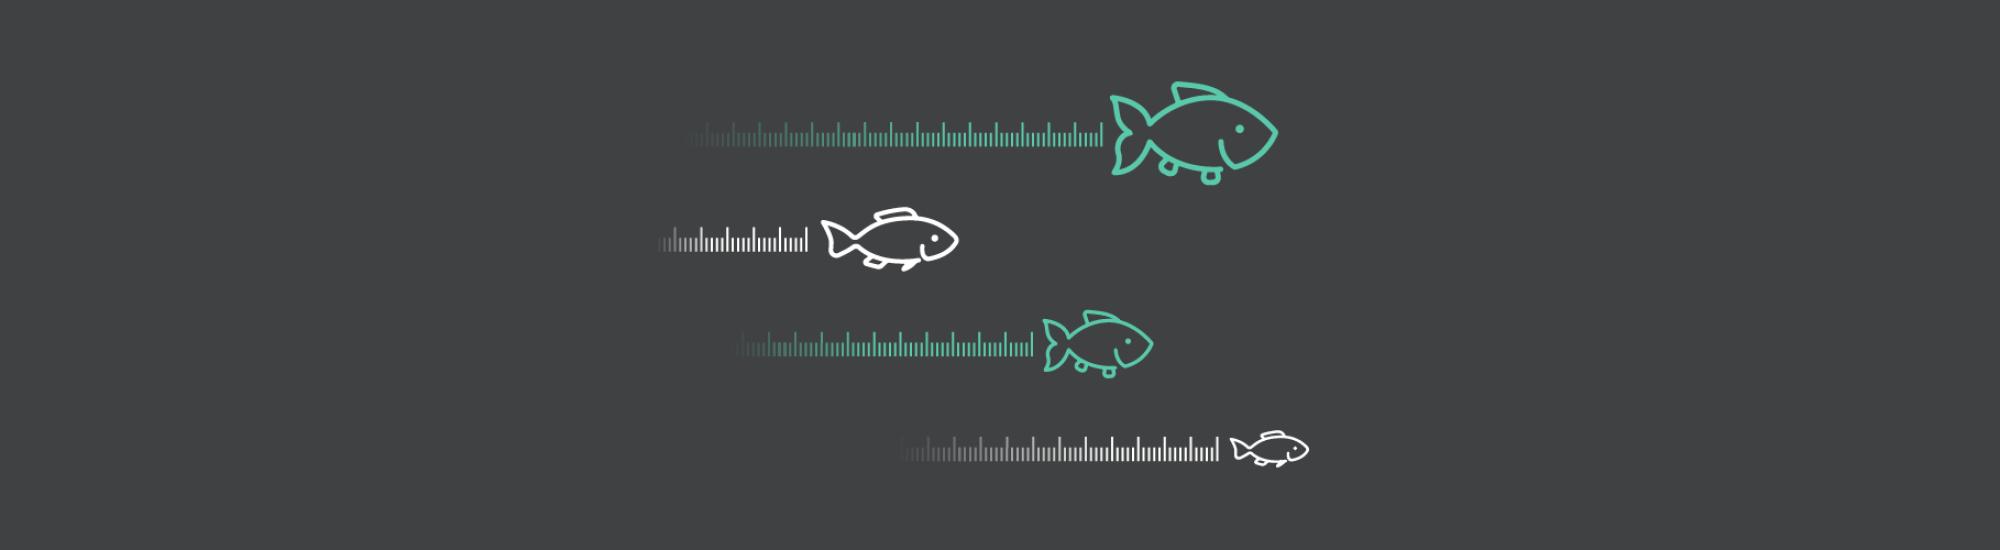 Measurement Just keep swimming HEAD